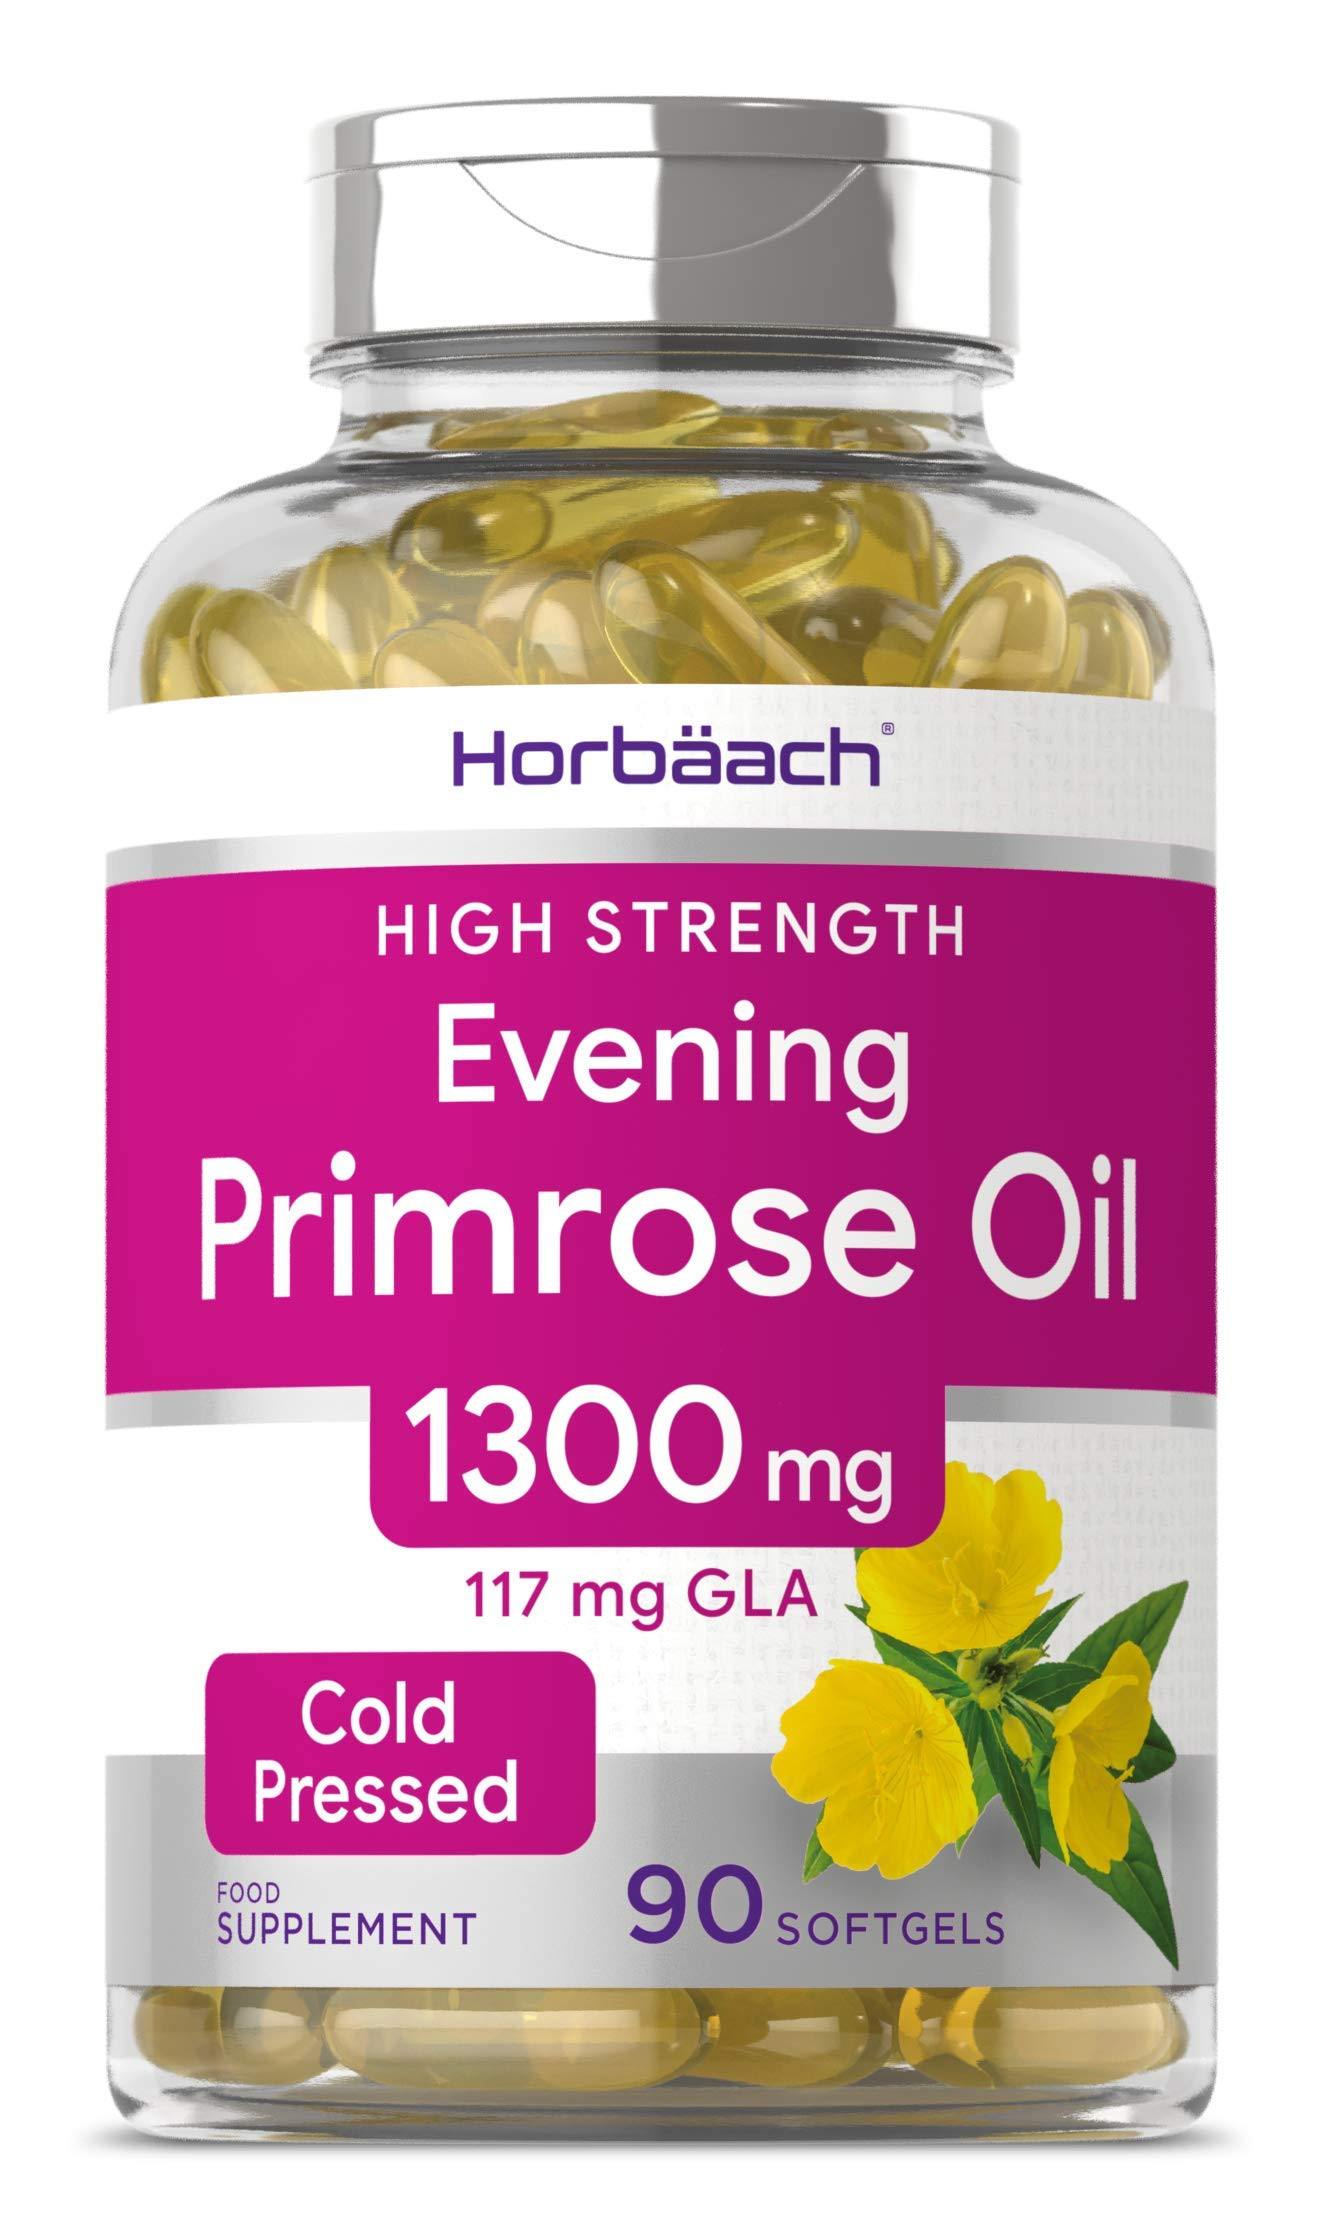 Evening Primrose Oil 1300mg | 90 Capsules | Rich Source of Omega 6 | 117mg GLA | Non-GMO, Gluten Free Supplement